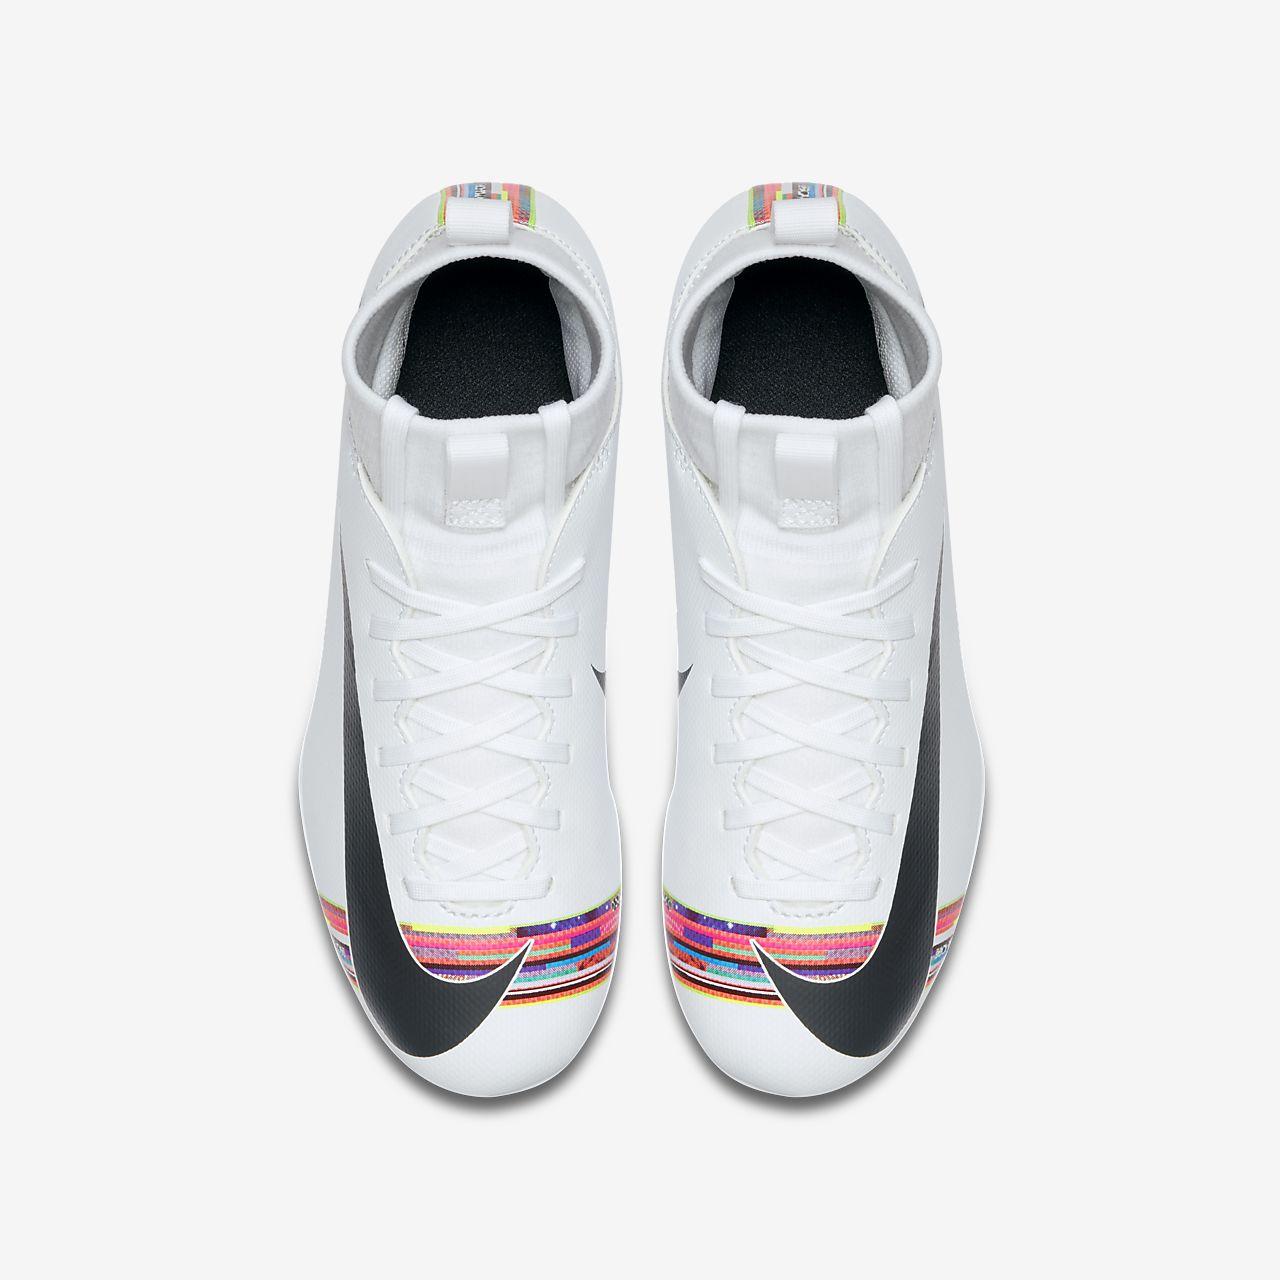 2aj3115 scarpe nike